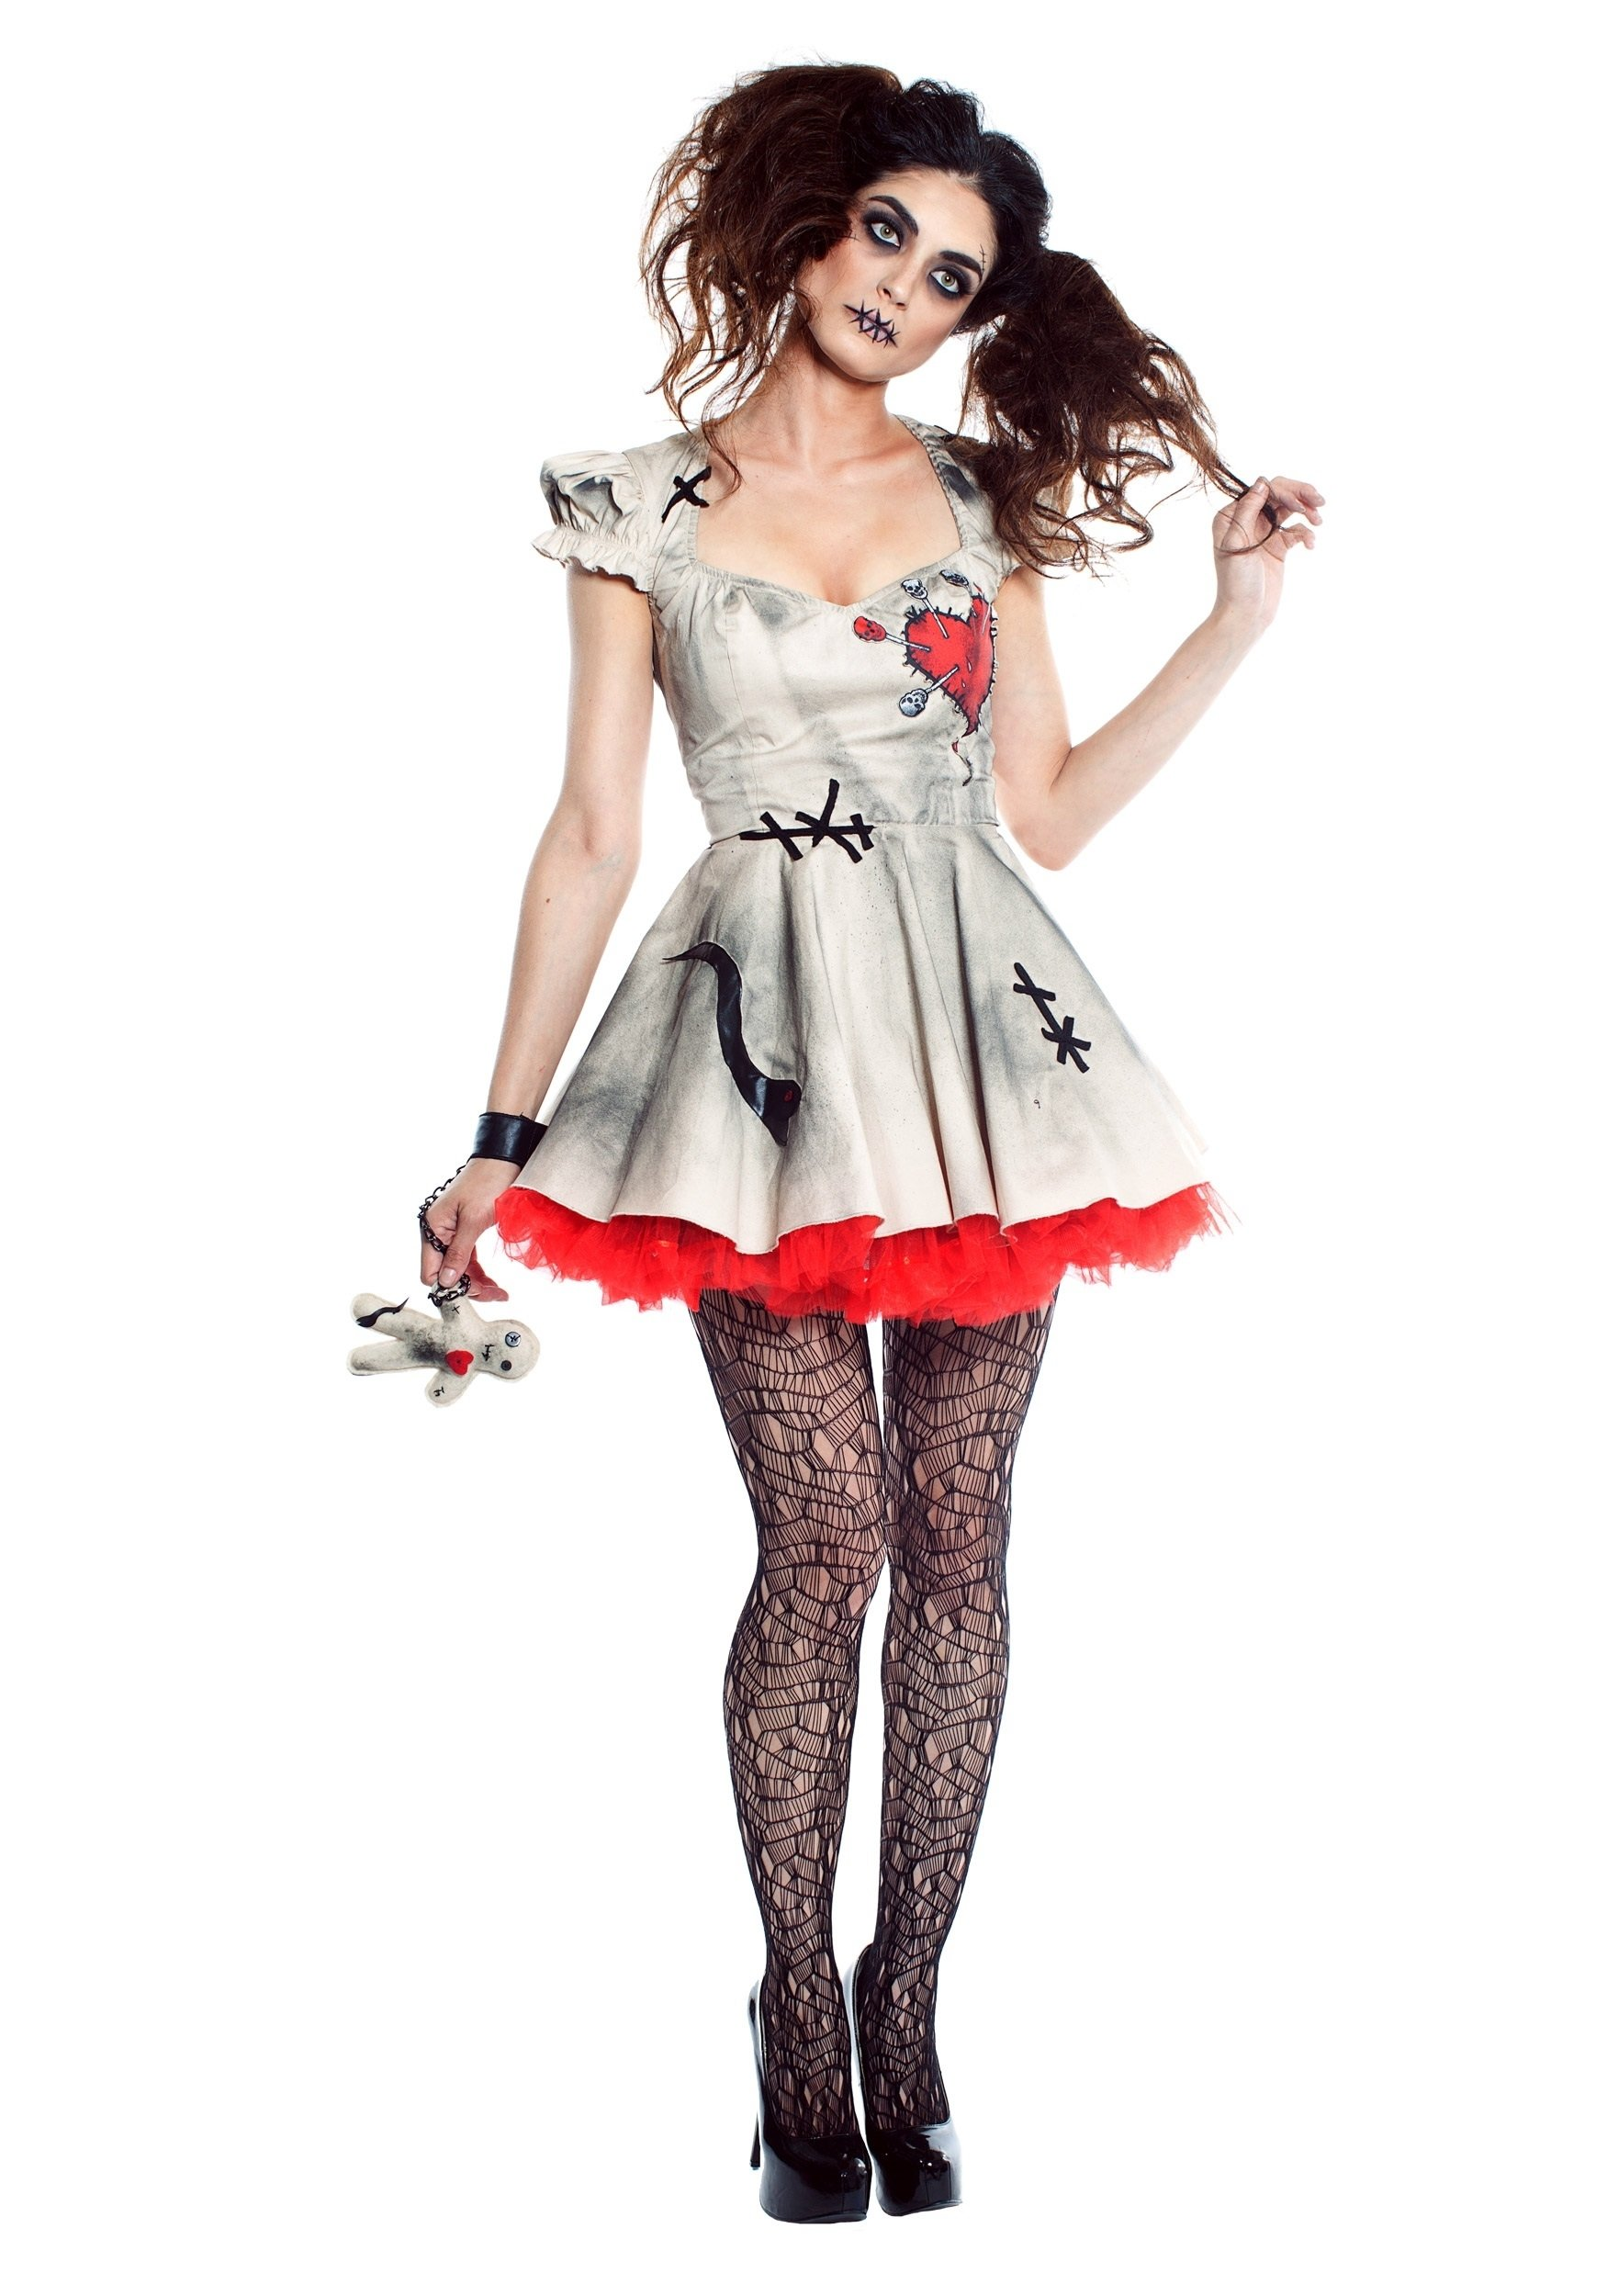 10 great creepy doll halloween costume ideas womens voodoo doll costume 3